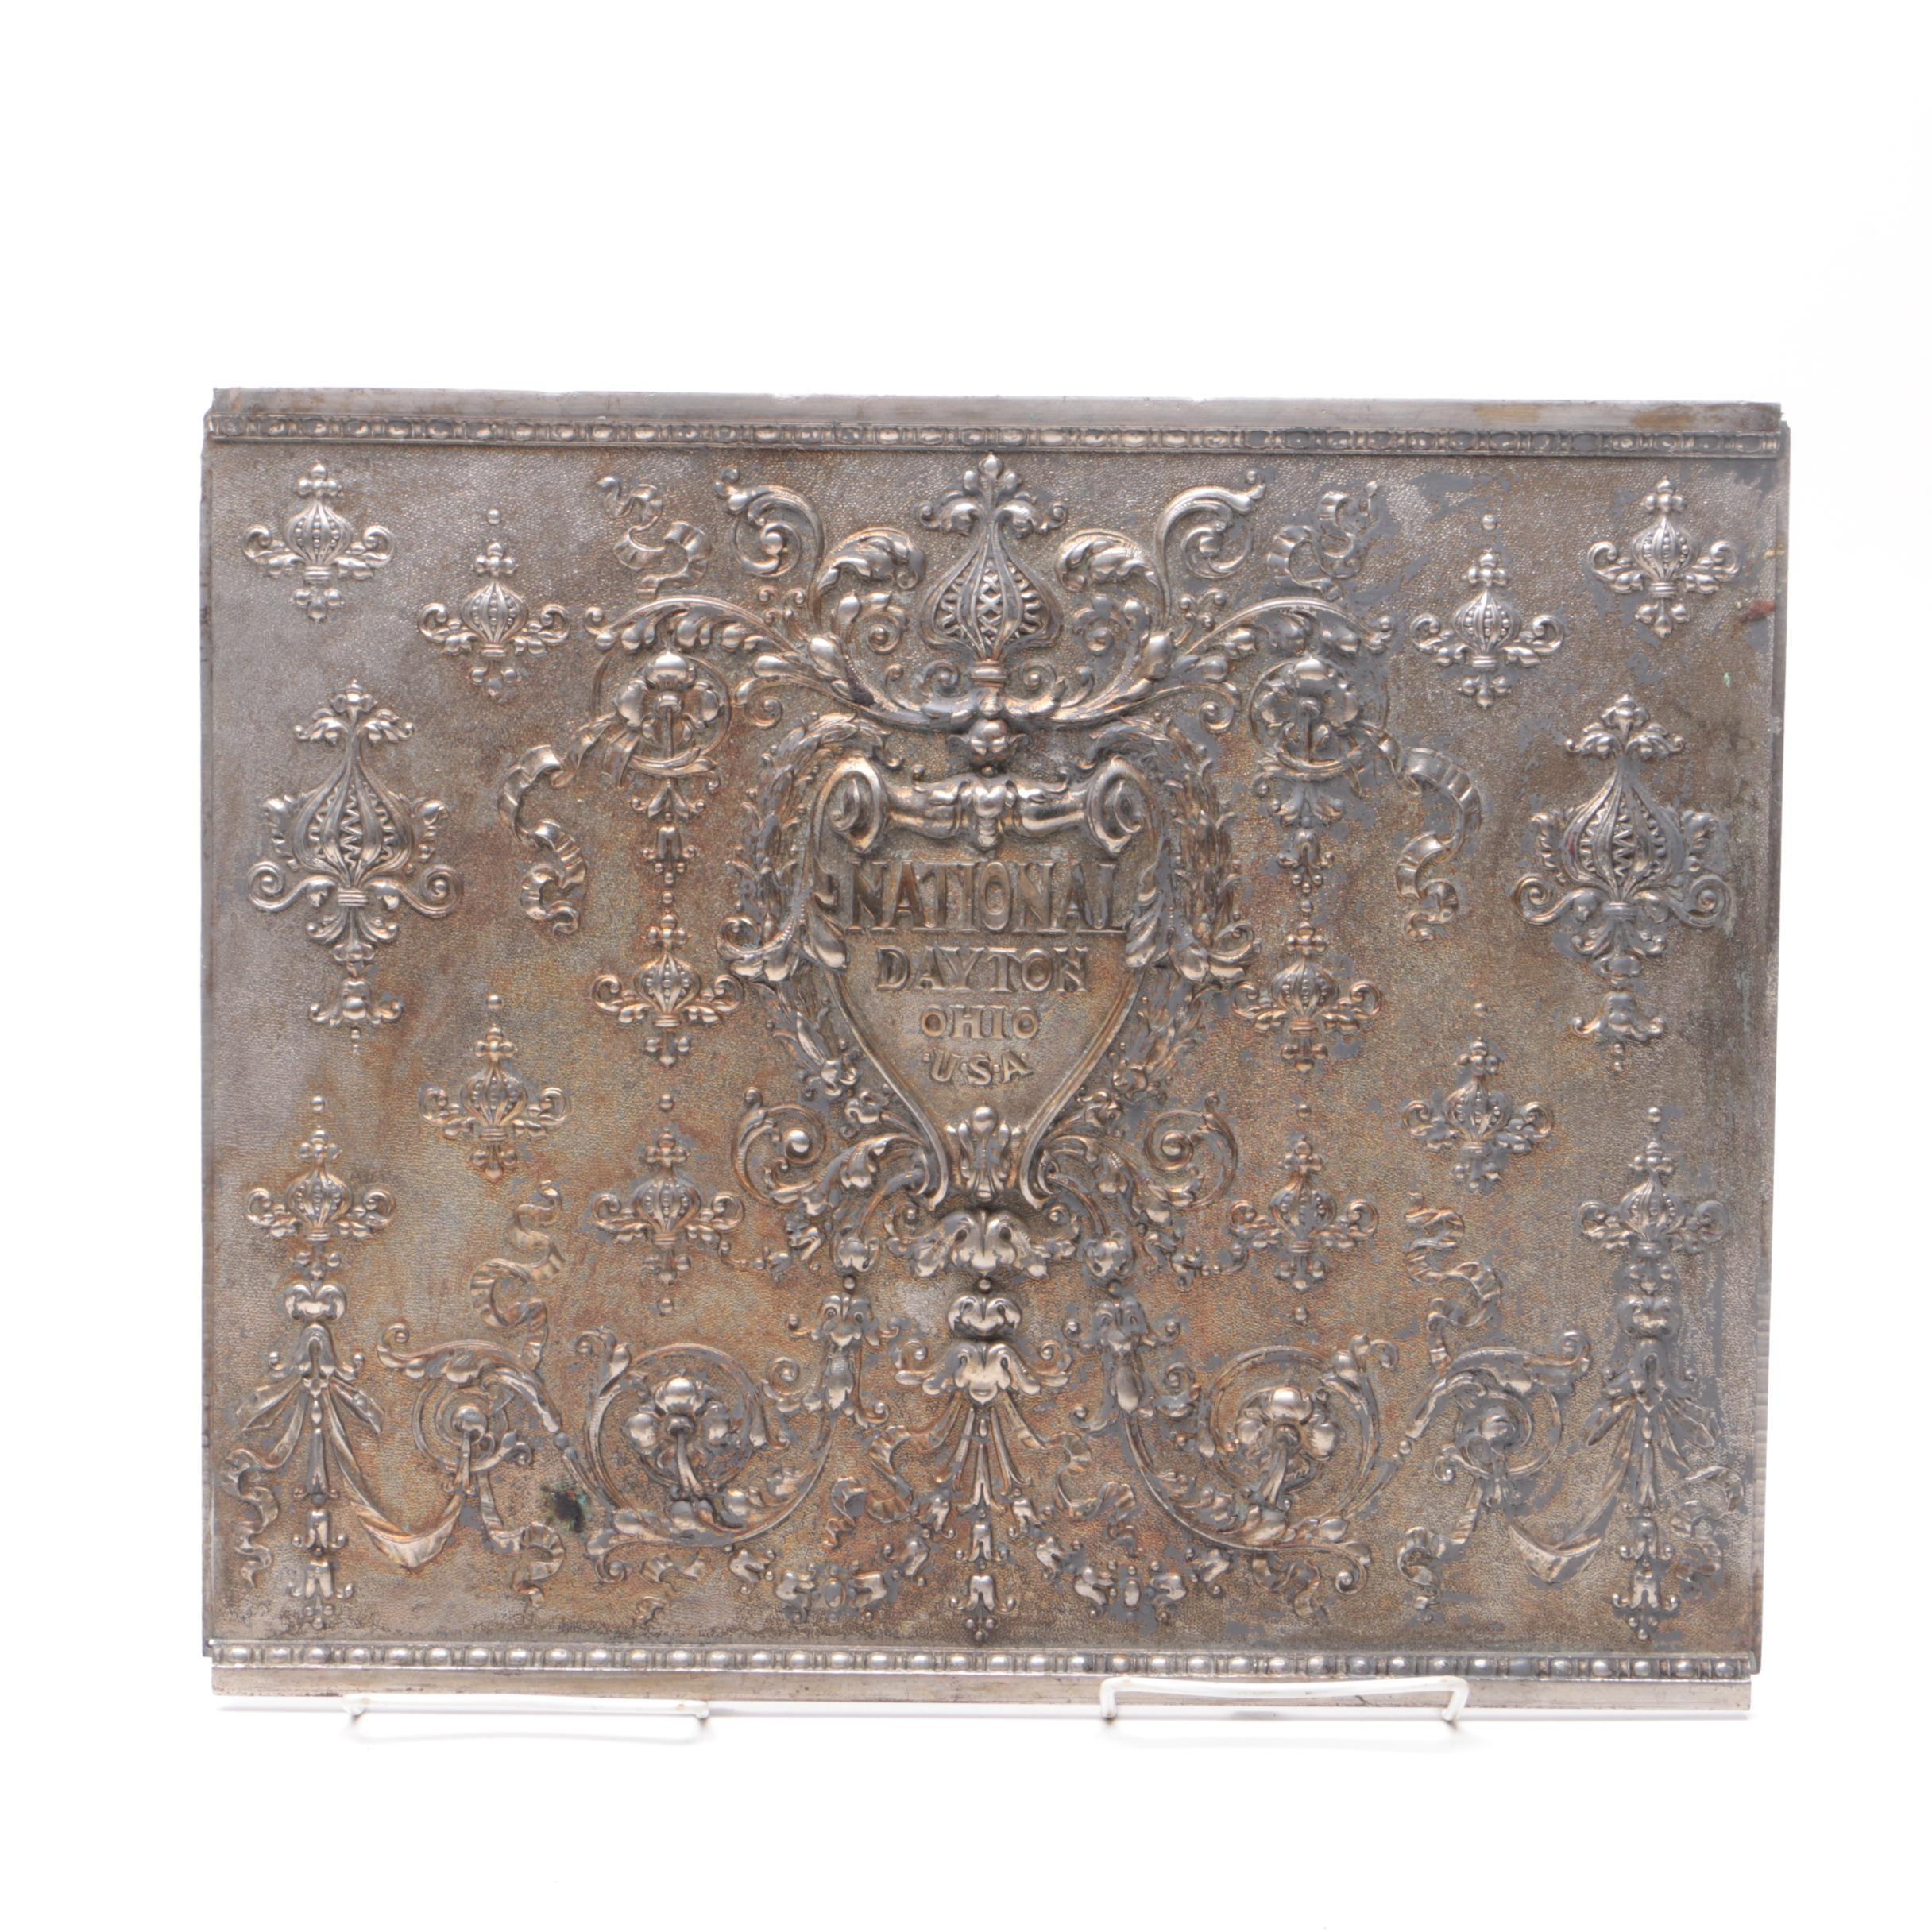 National Dayton Ohio Cash Register Plate